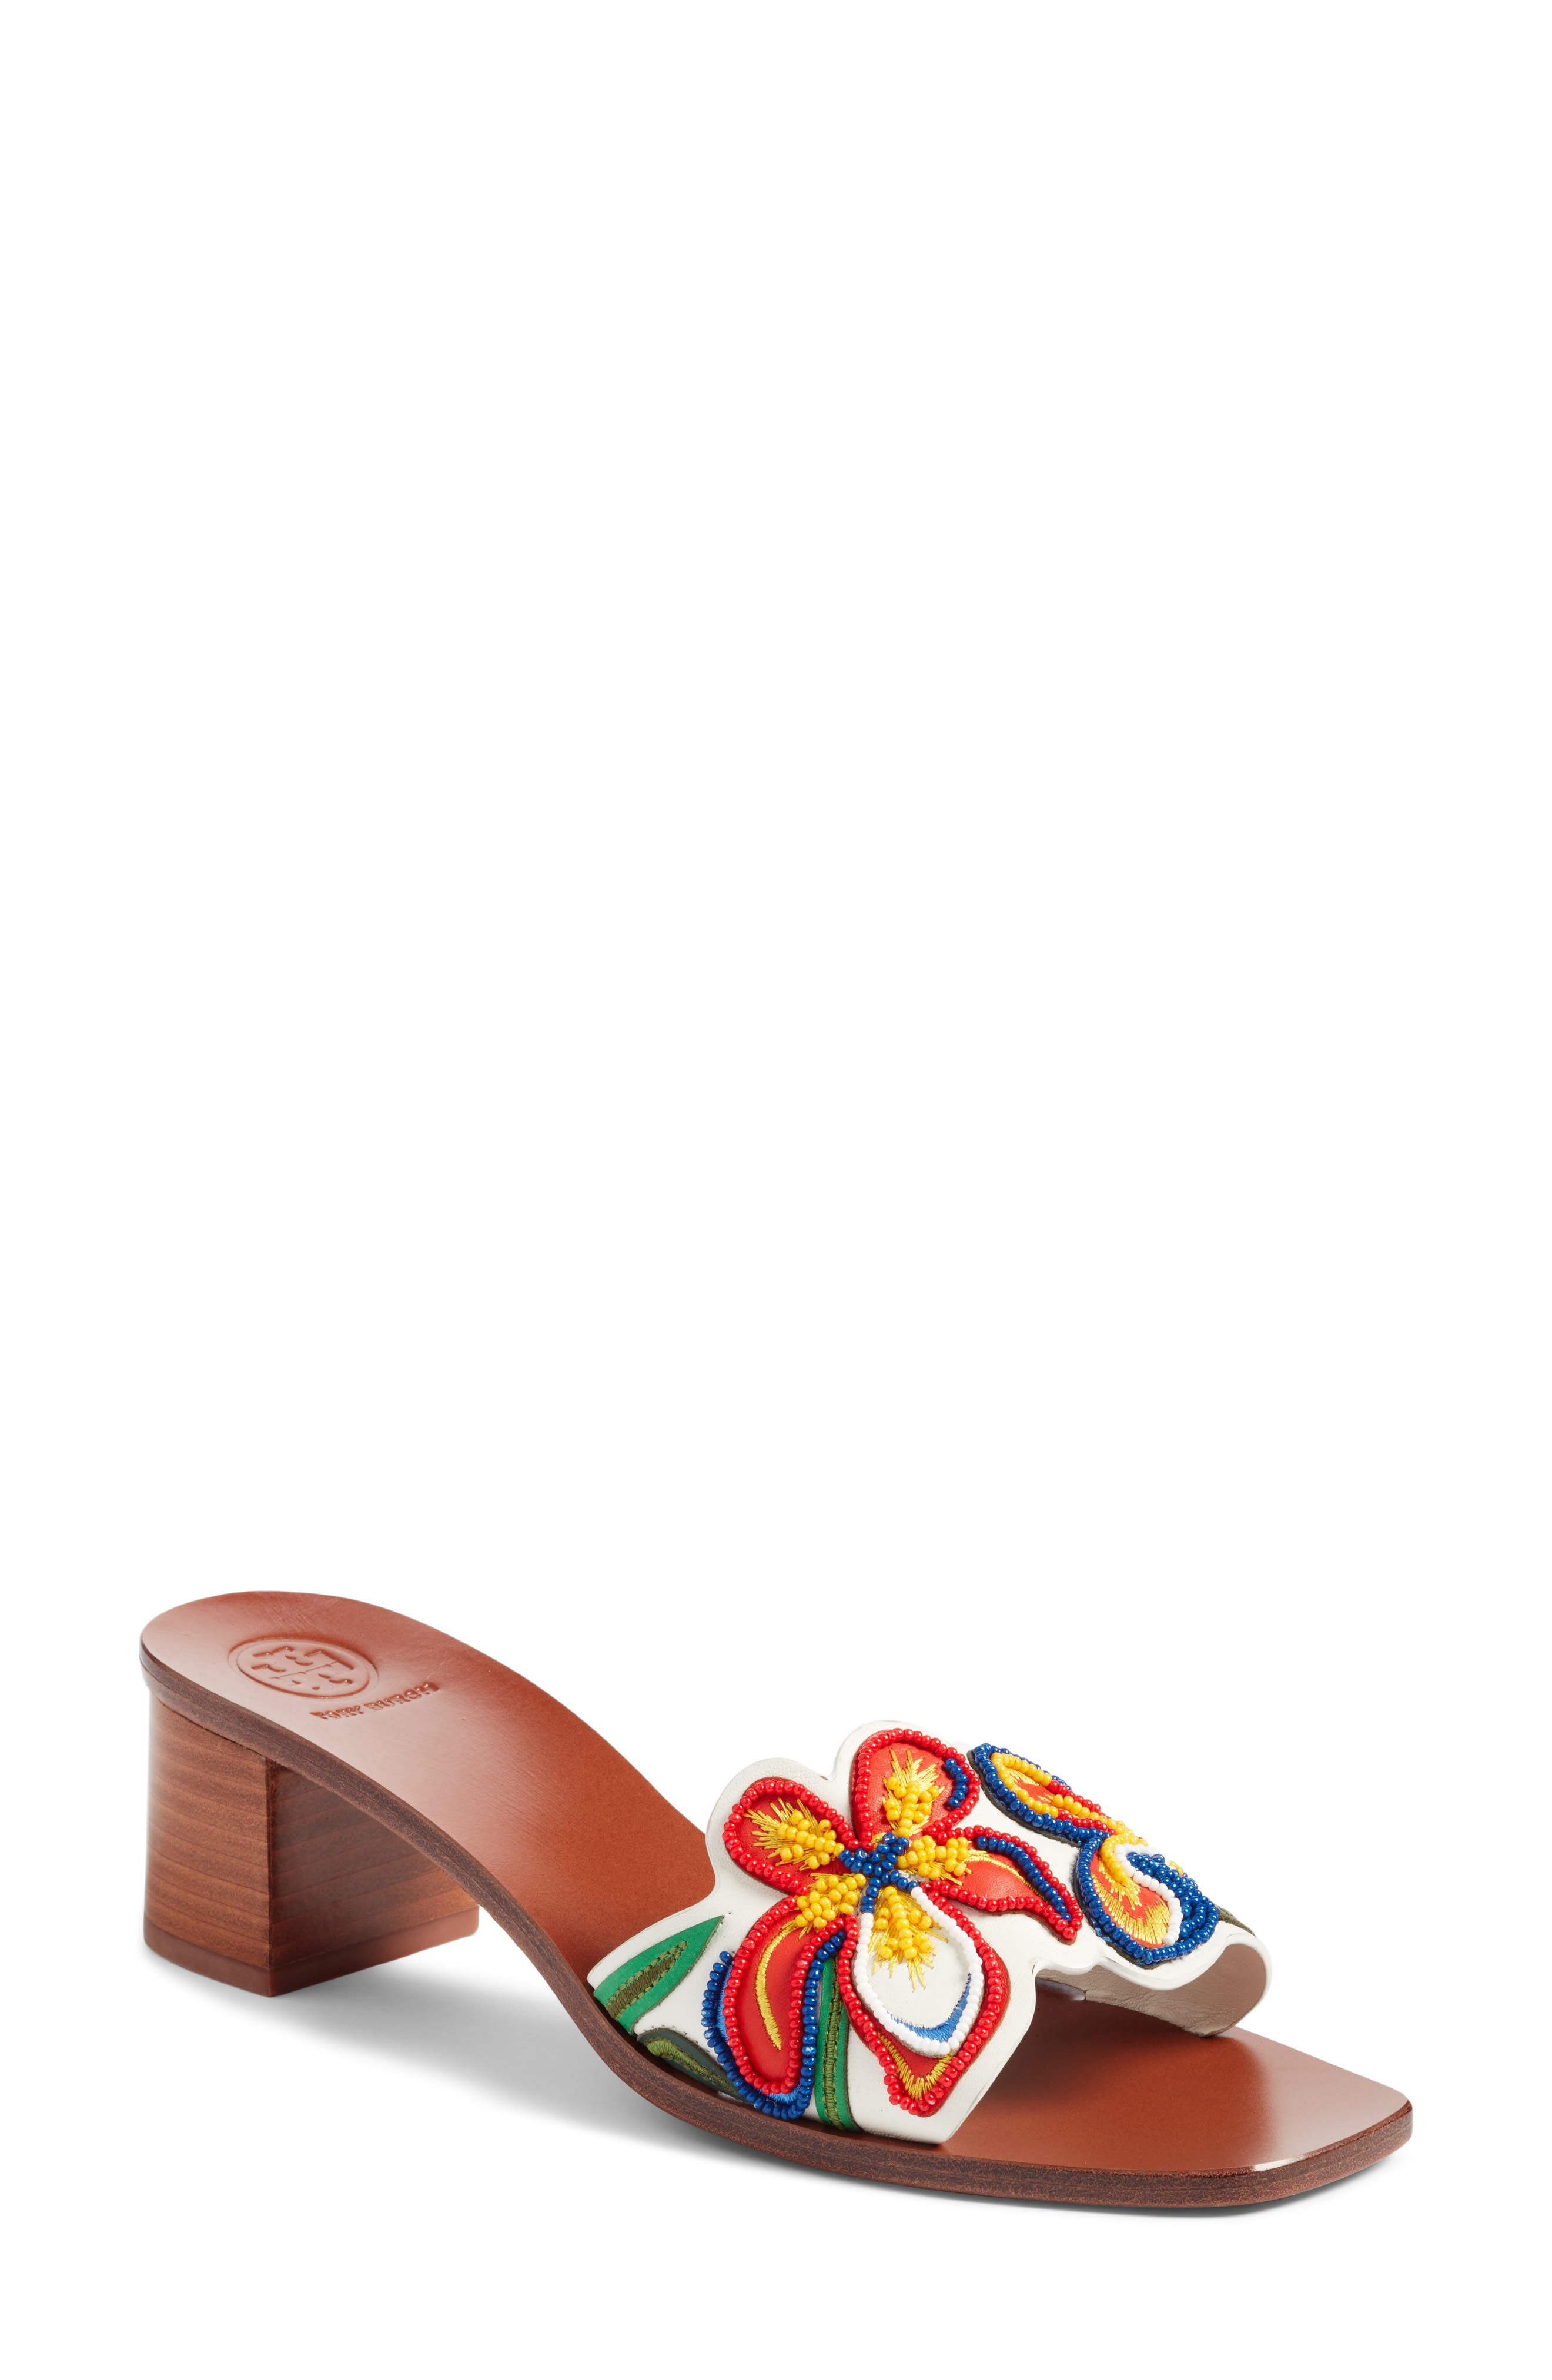 Bianca Floral Embellished Slide Sandal,                             Main thumbnail 1, color,                             Perfect Ivory/ Multi Color